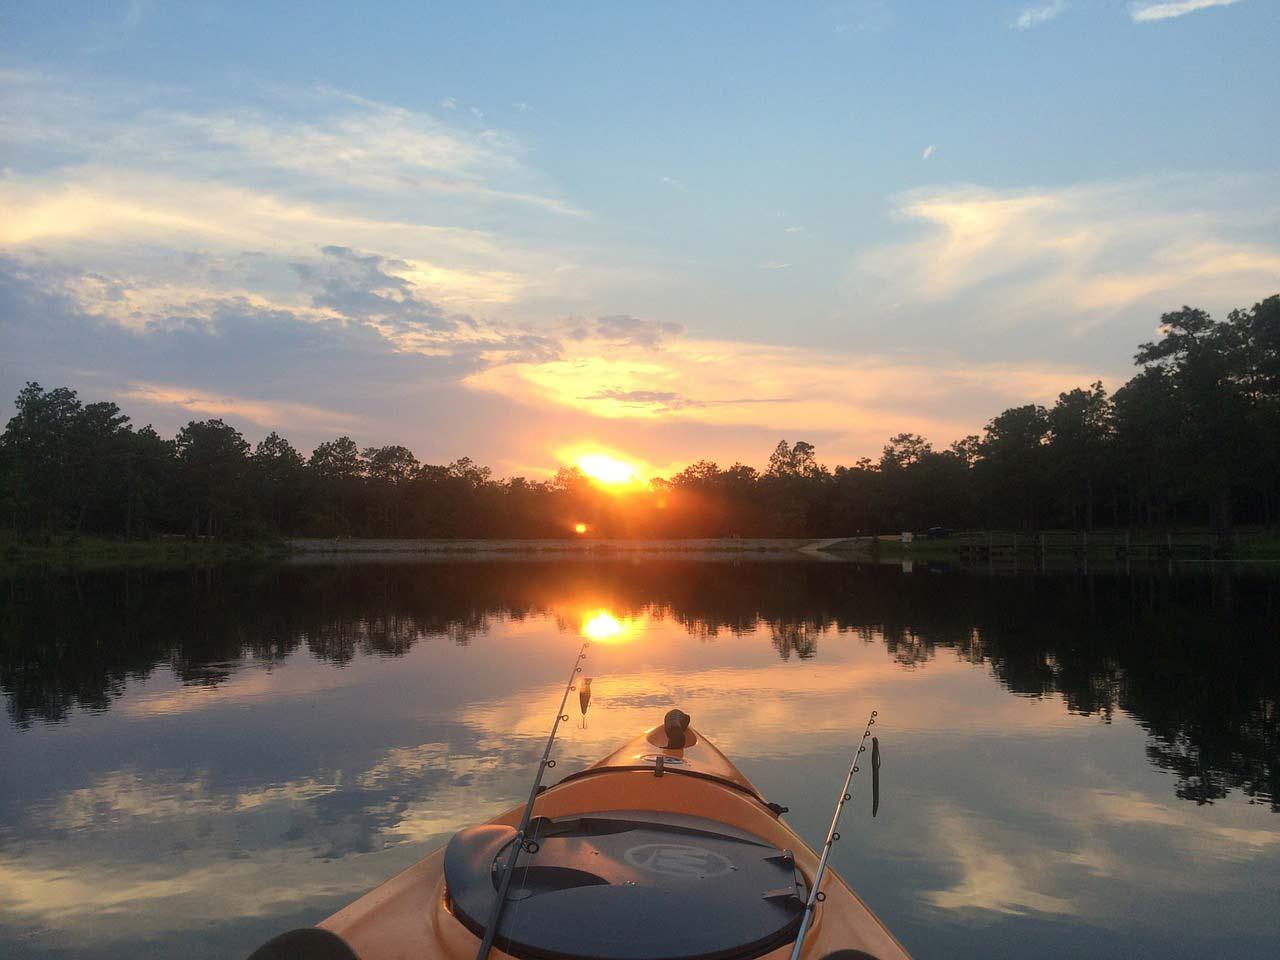 Kayak Fishing 101: 5 Essential Kayak Fishing Tips for Newbies 5